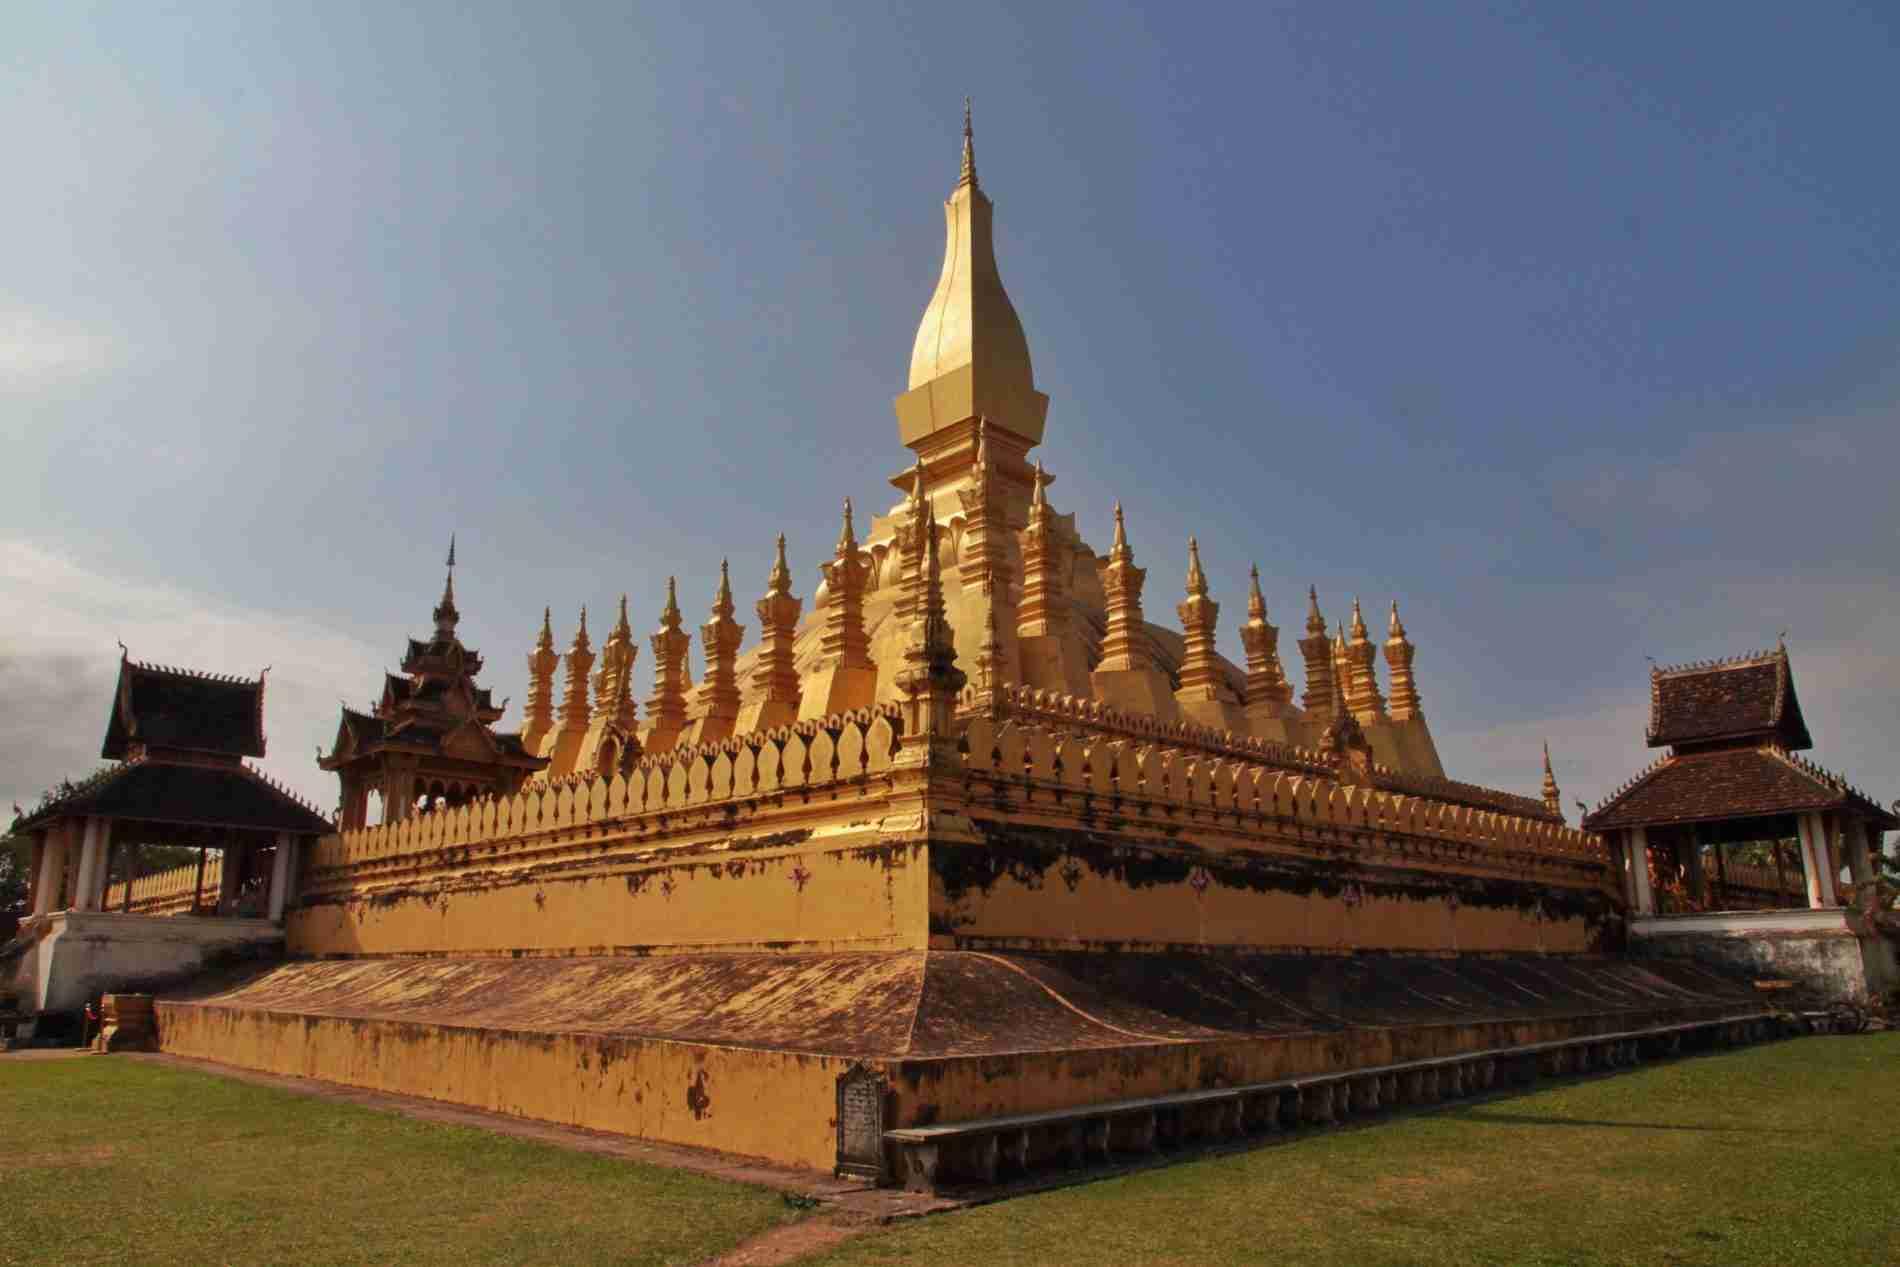 Phra That Luang Vientiane